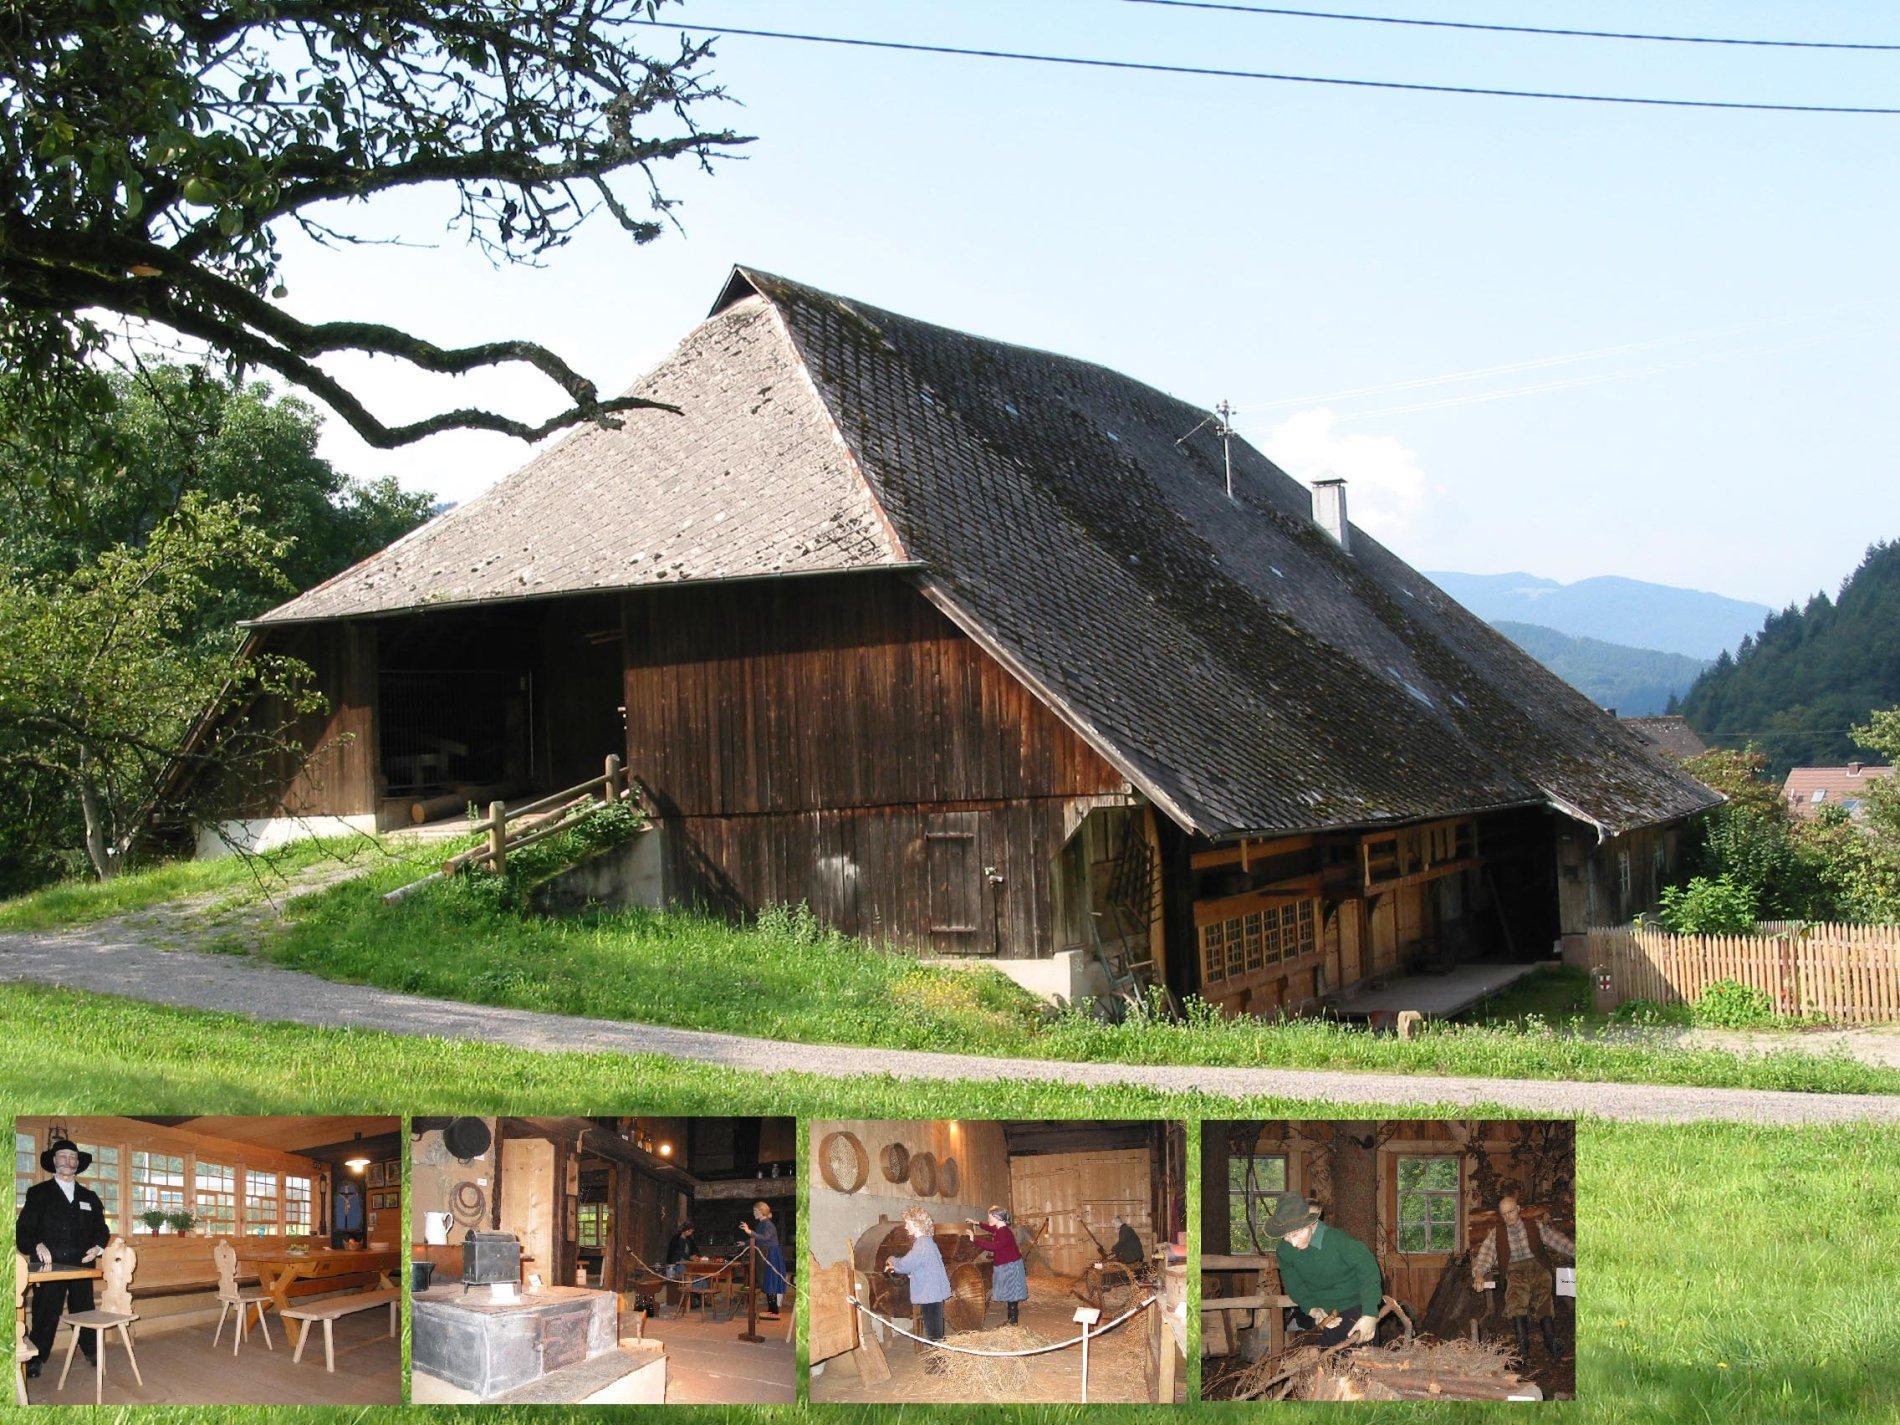 Hansmeyerhof Heimatmuseum in Buchenbach